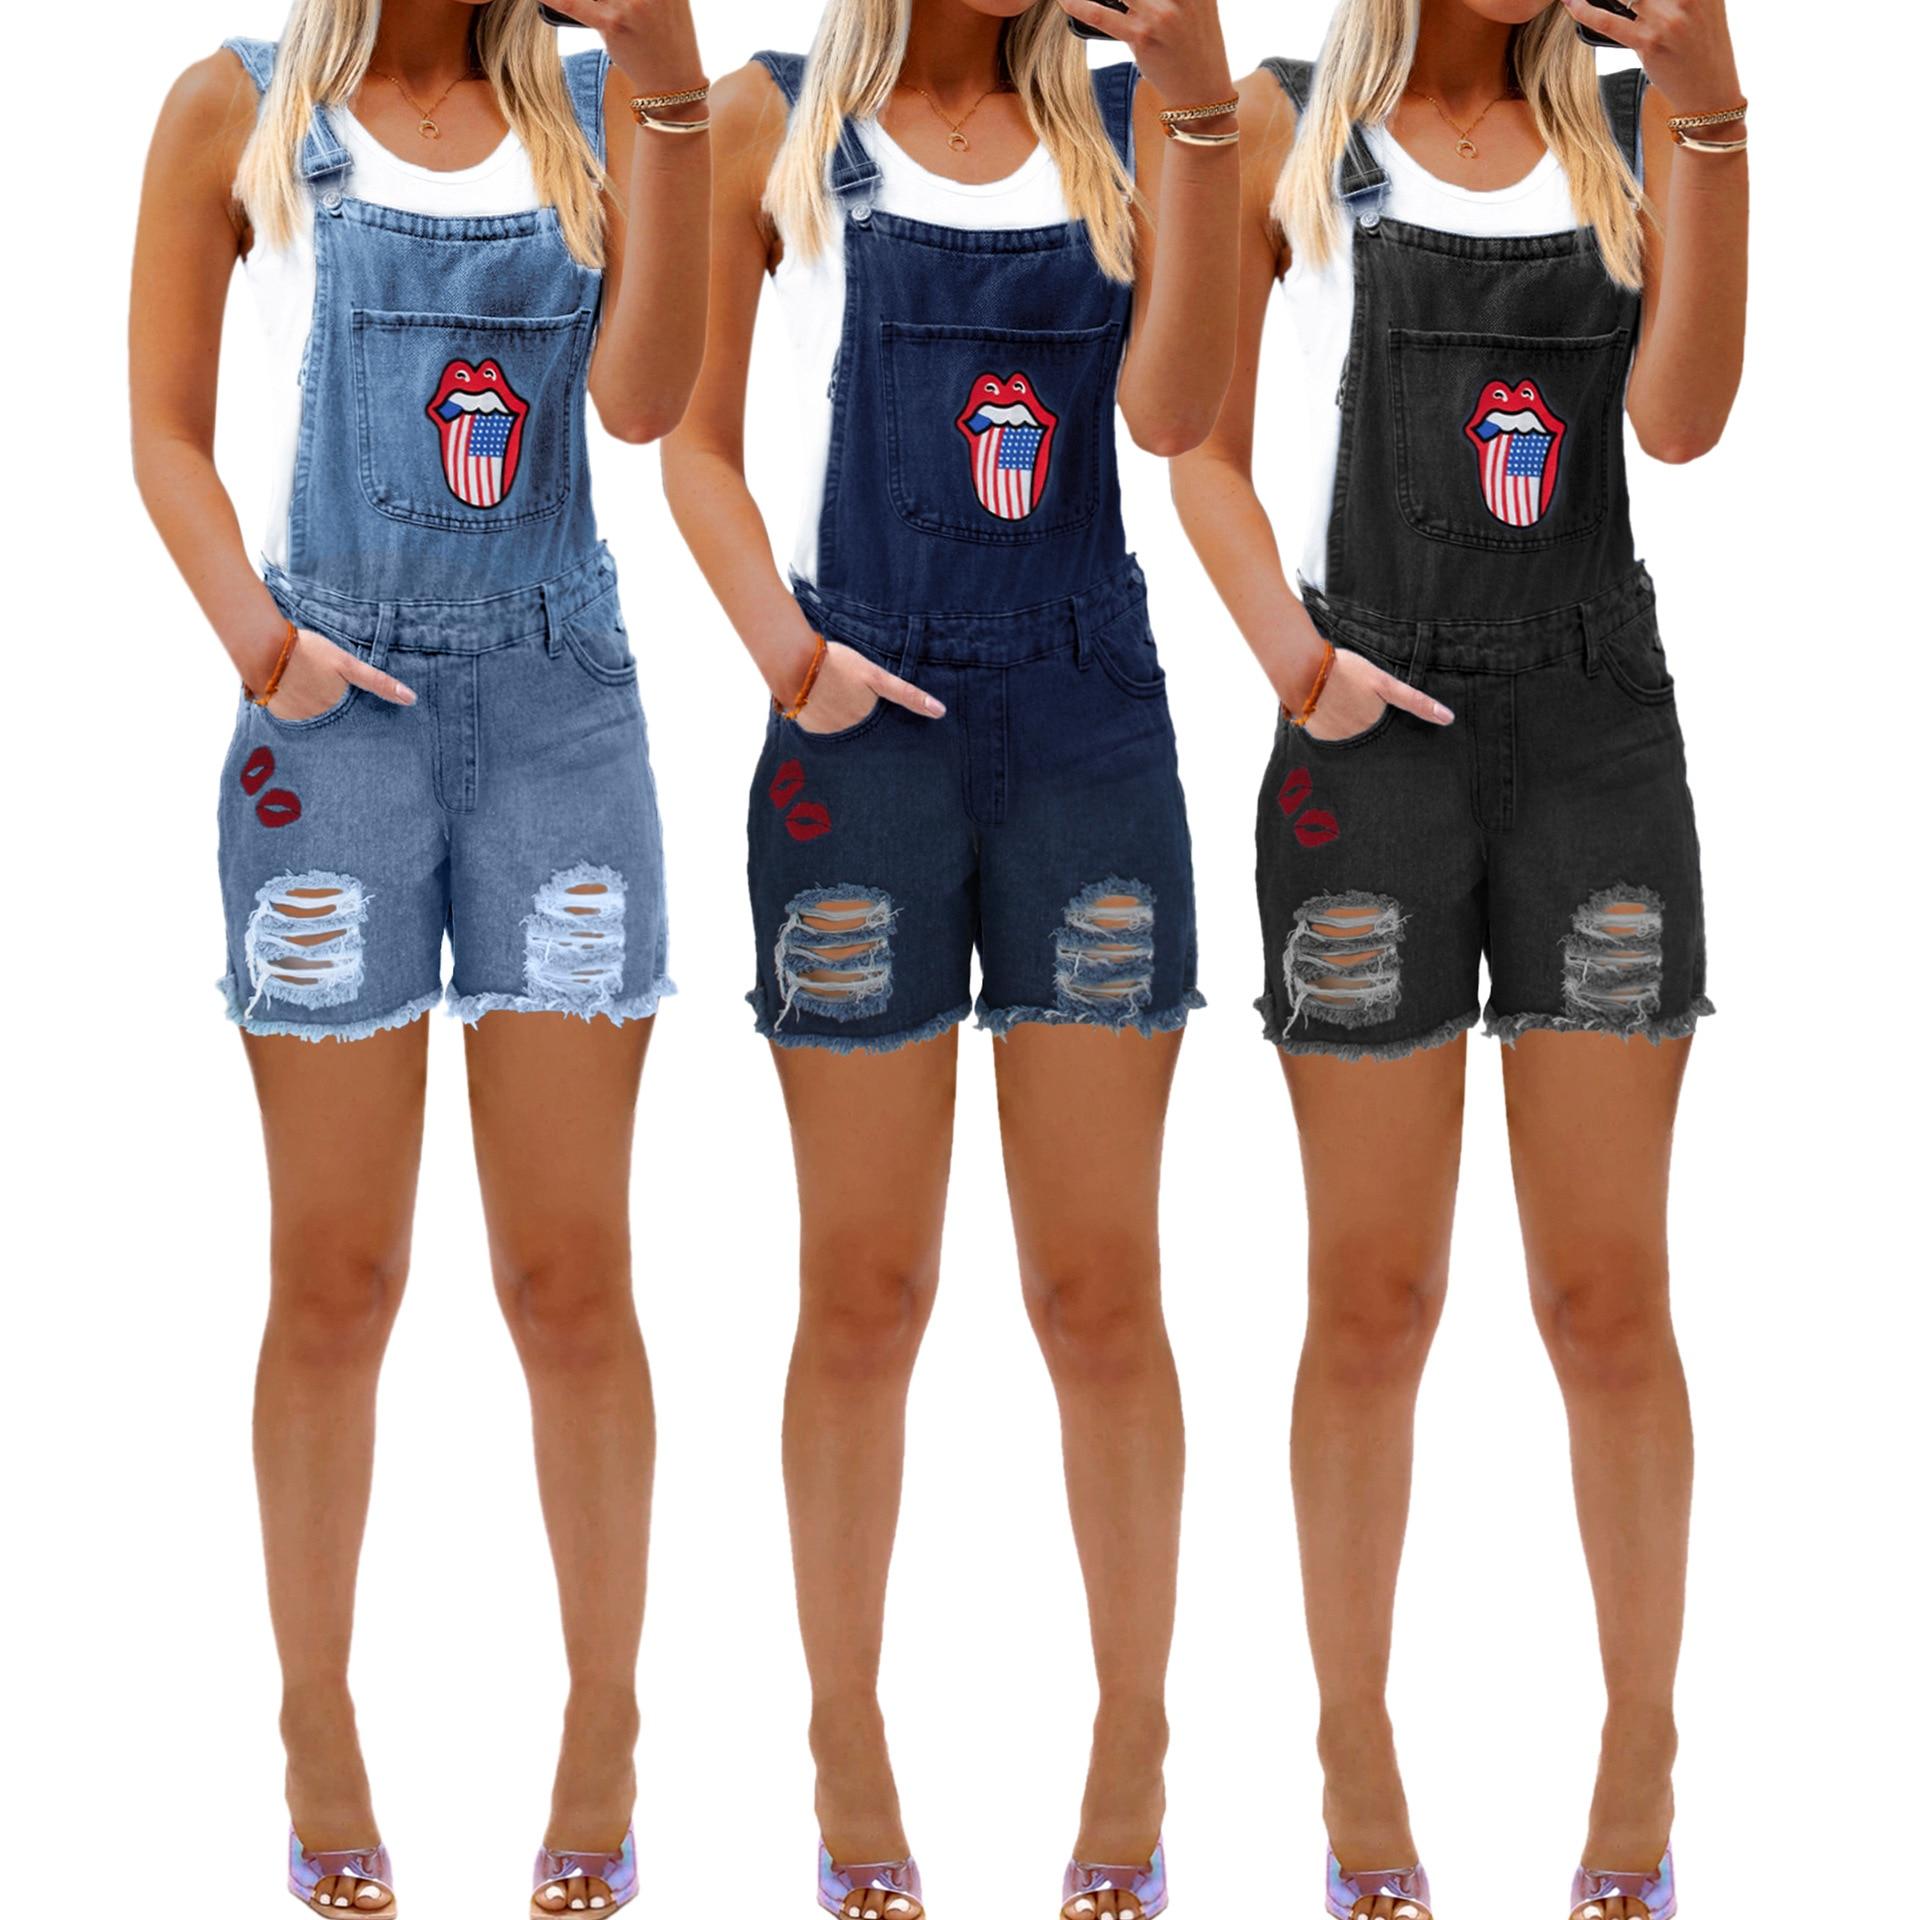 Women's Bib Leggings, Ripped Jeans for Women 1